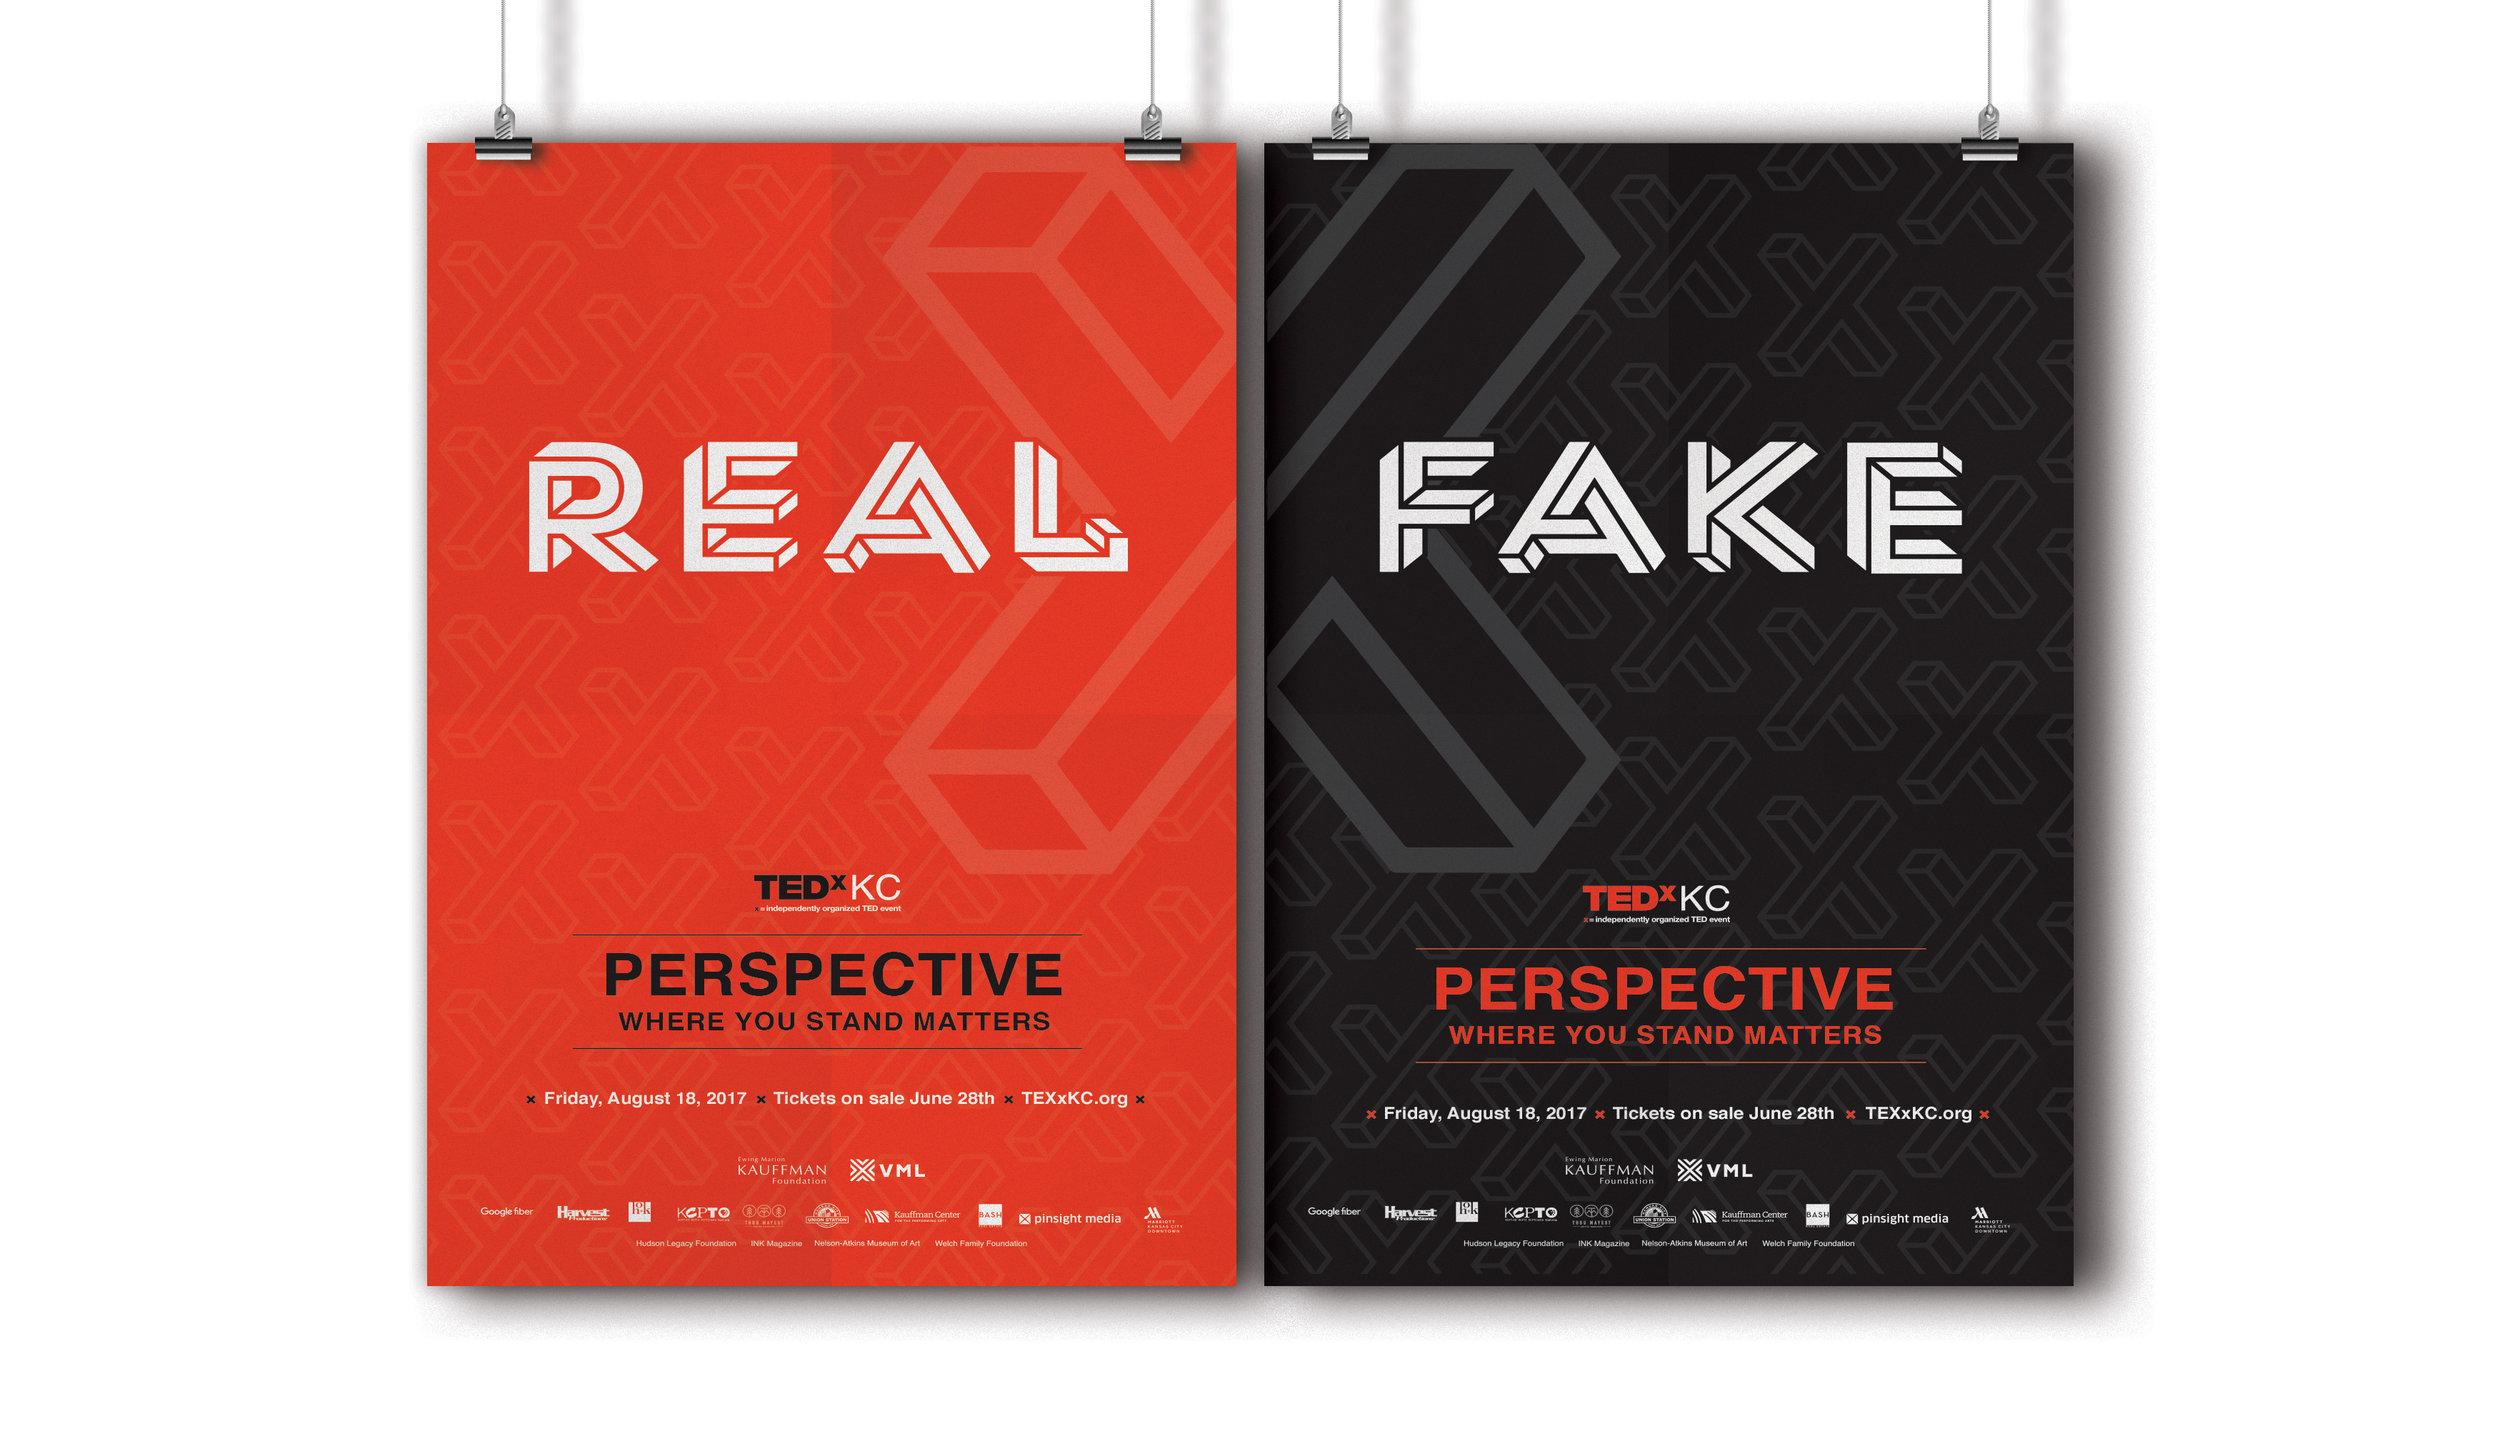 tedx-two-posters-1.jpg